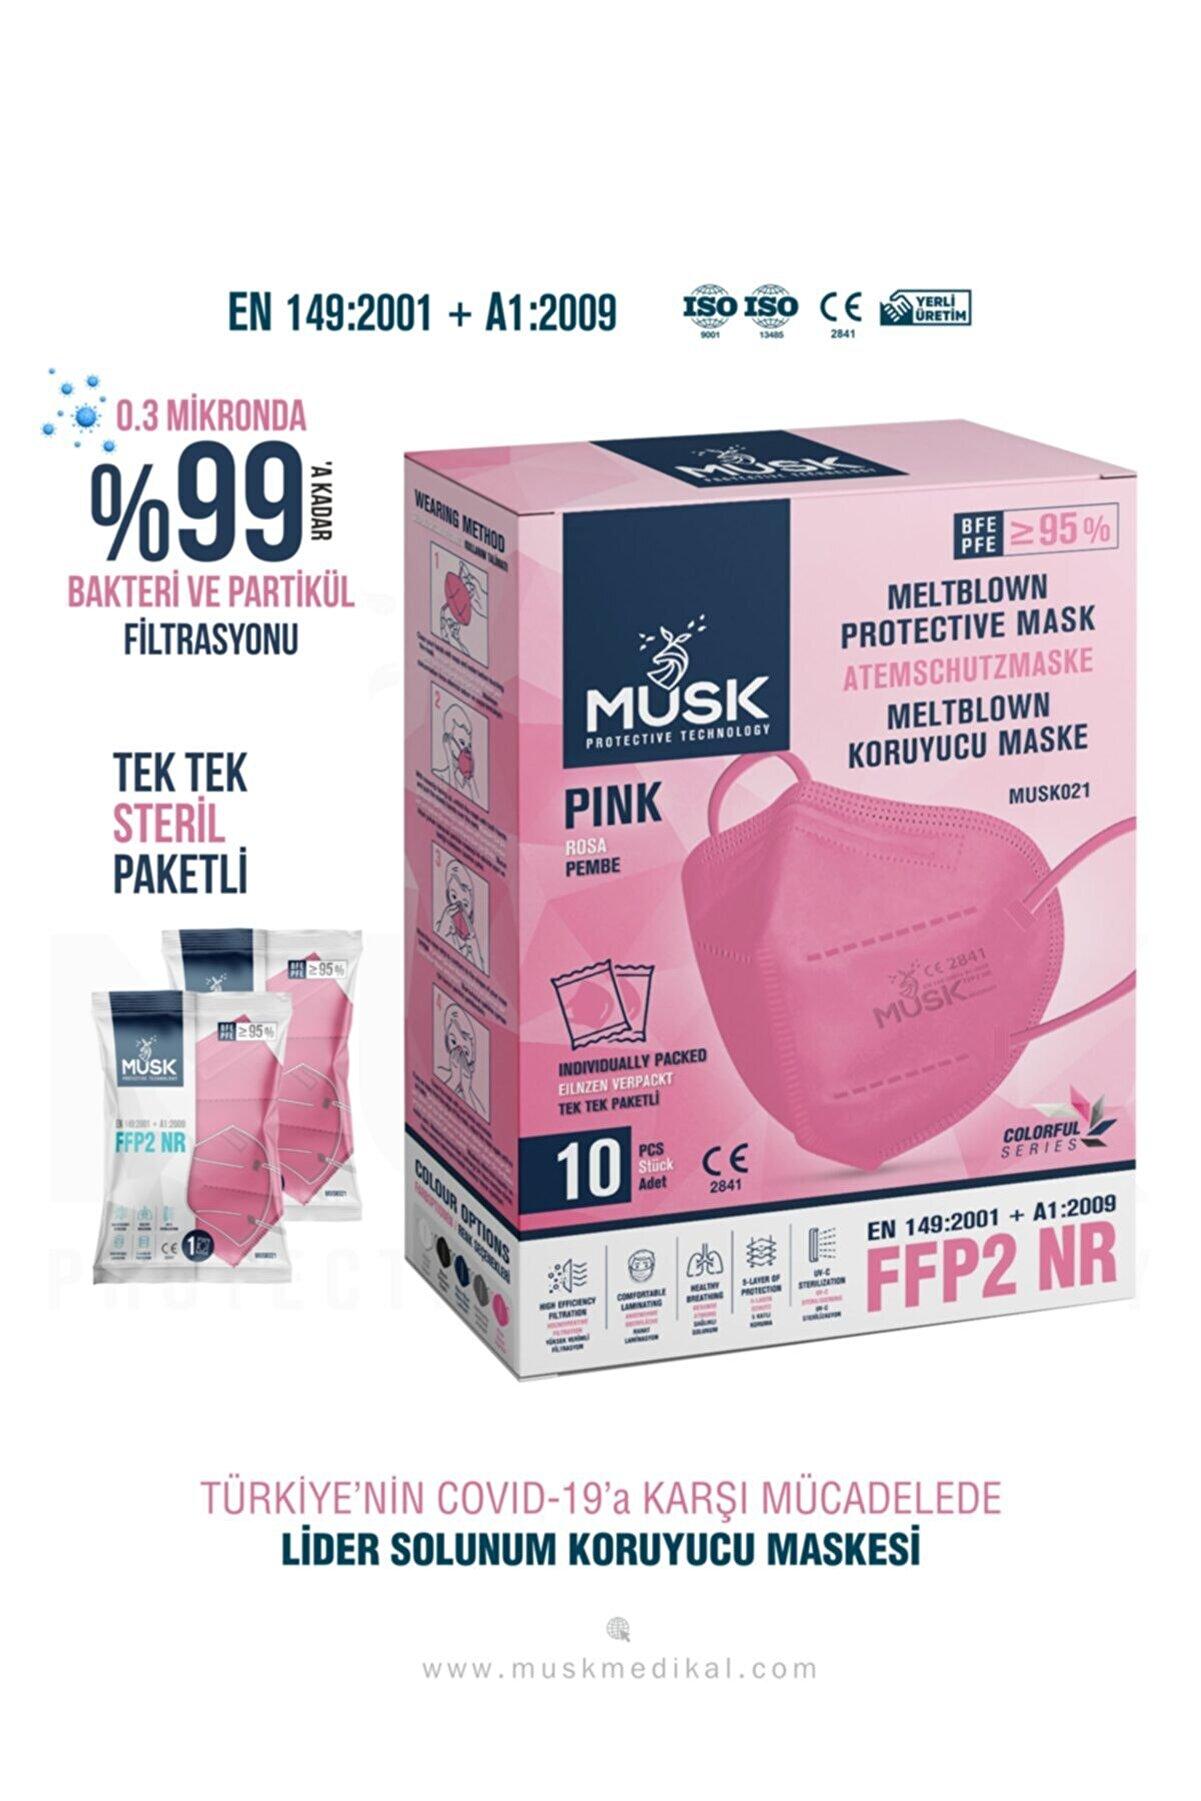 Musk Ffp2 Nr Özellikli Ce Ve Iso Sertifikalı 10 Adet Maske(pembe)